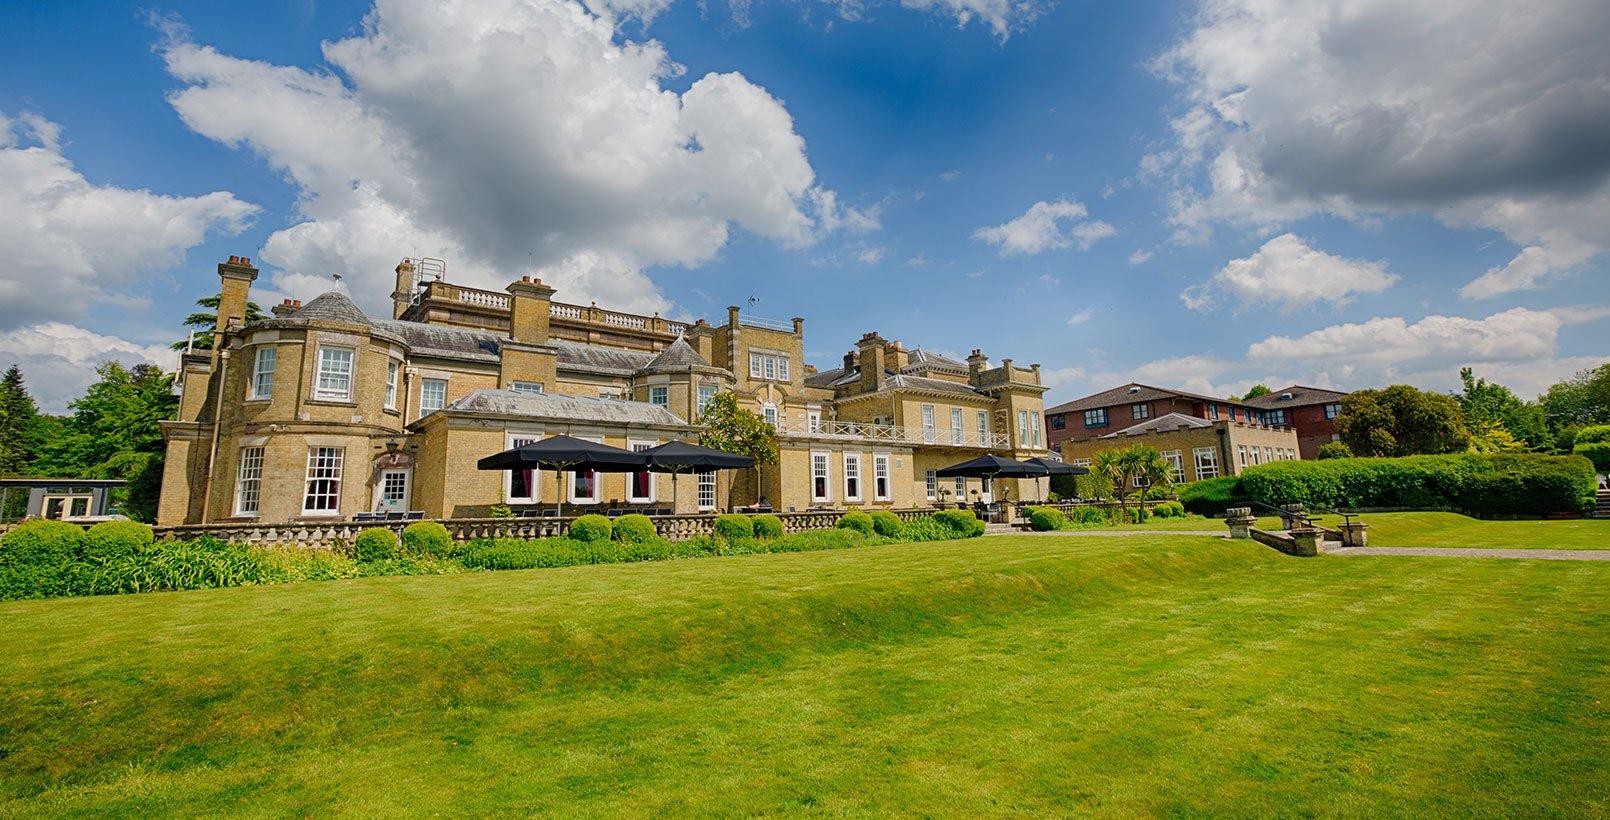 Chilworth Manor